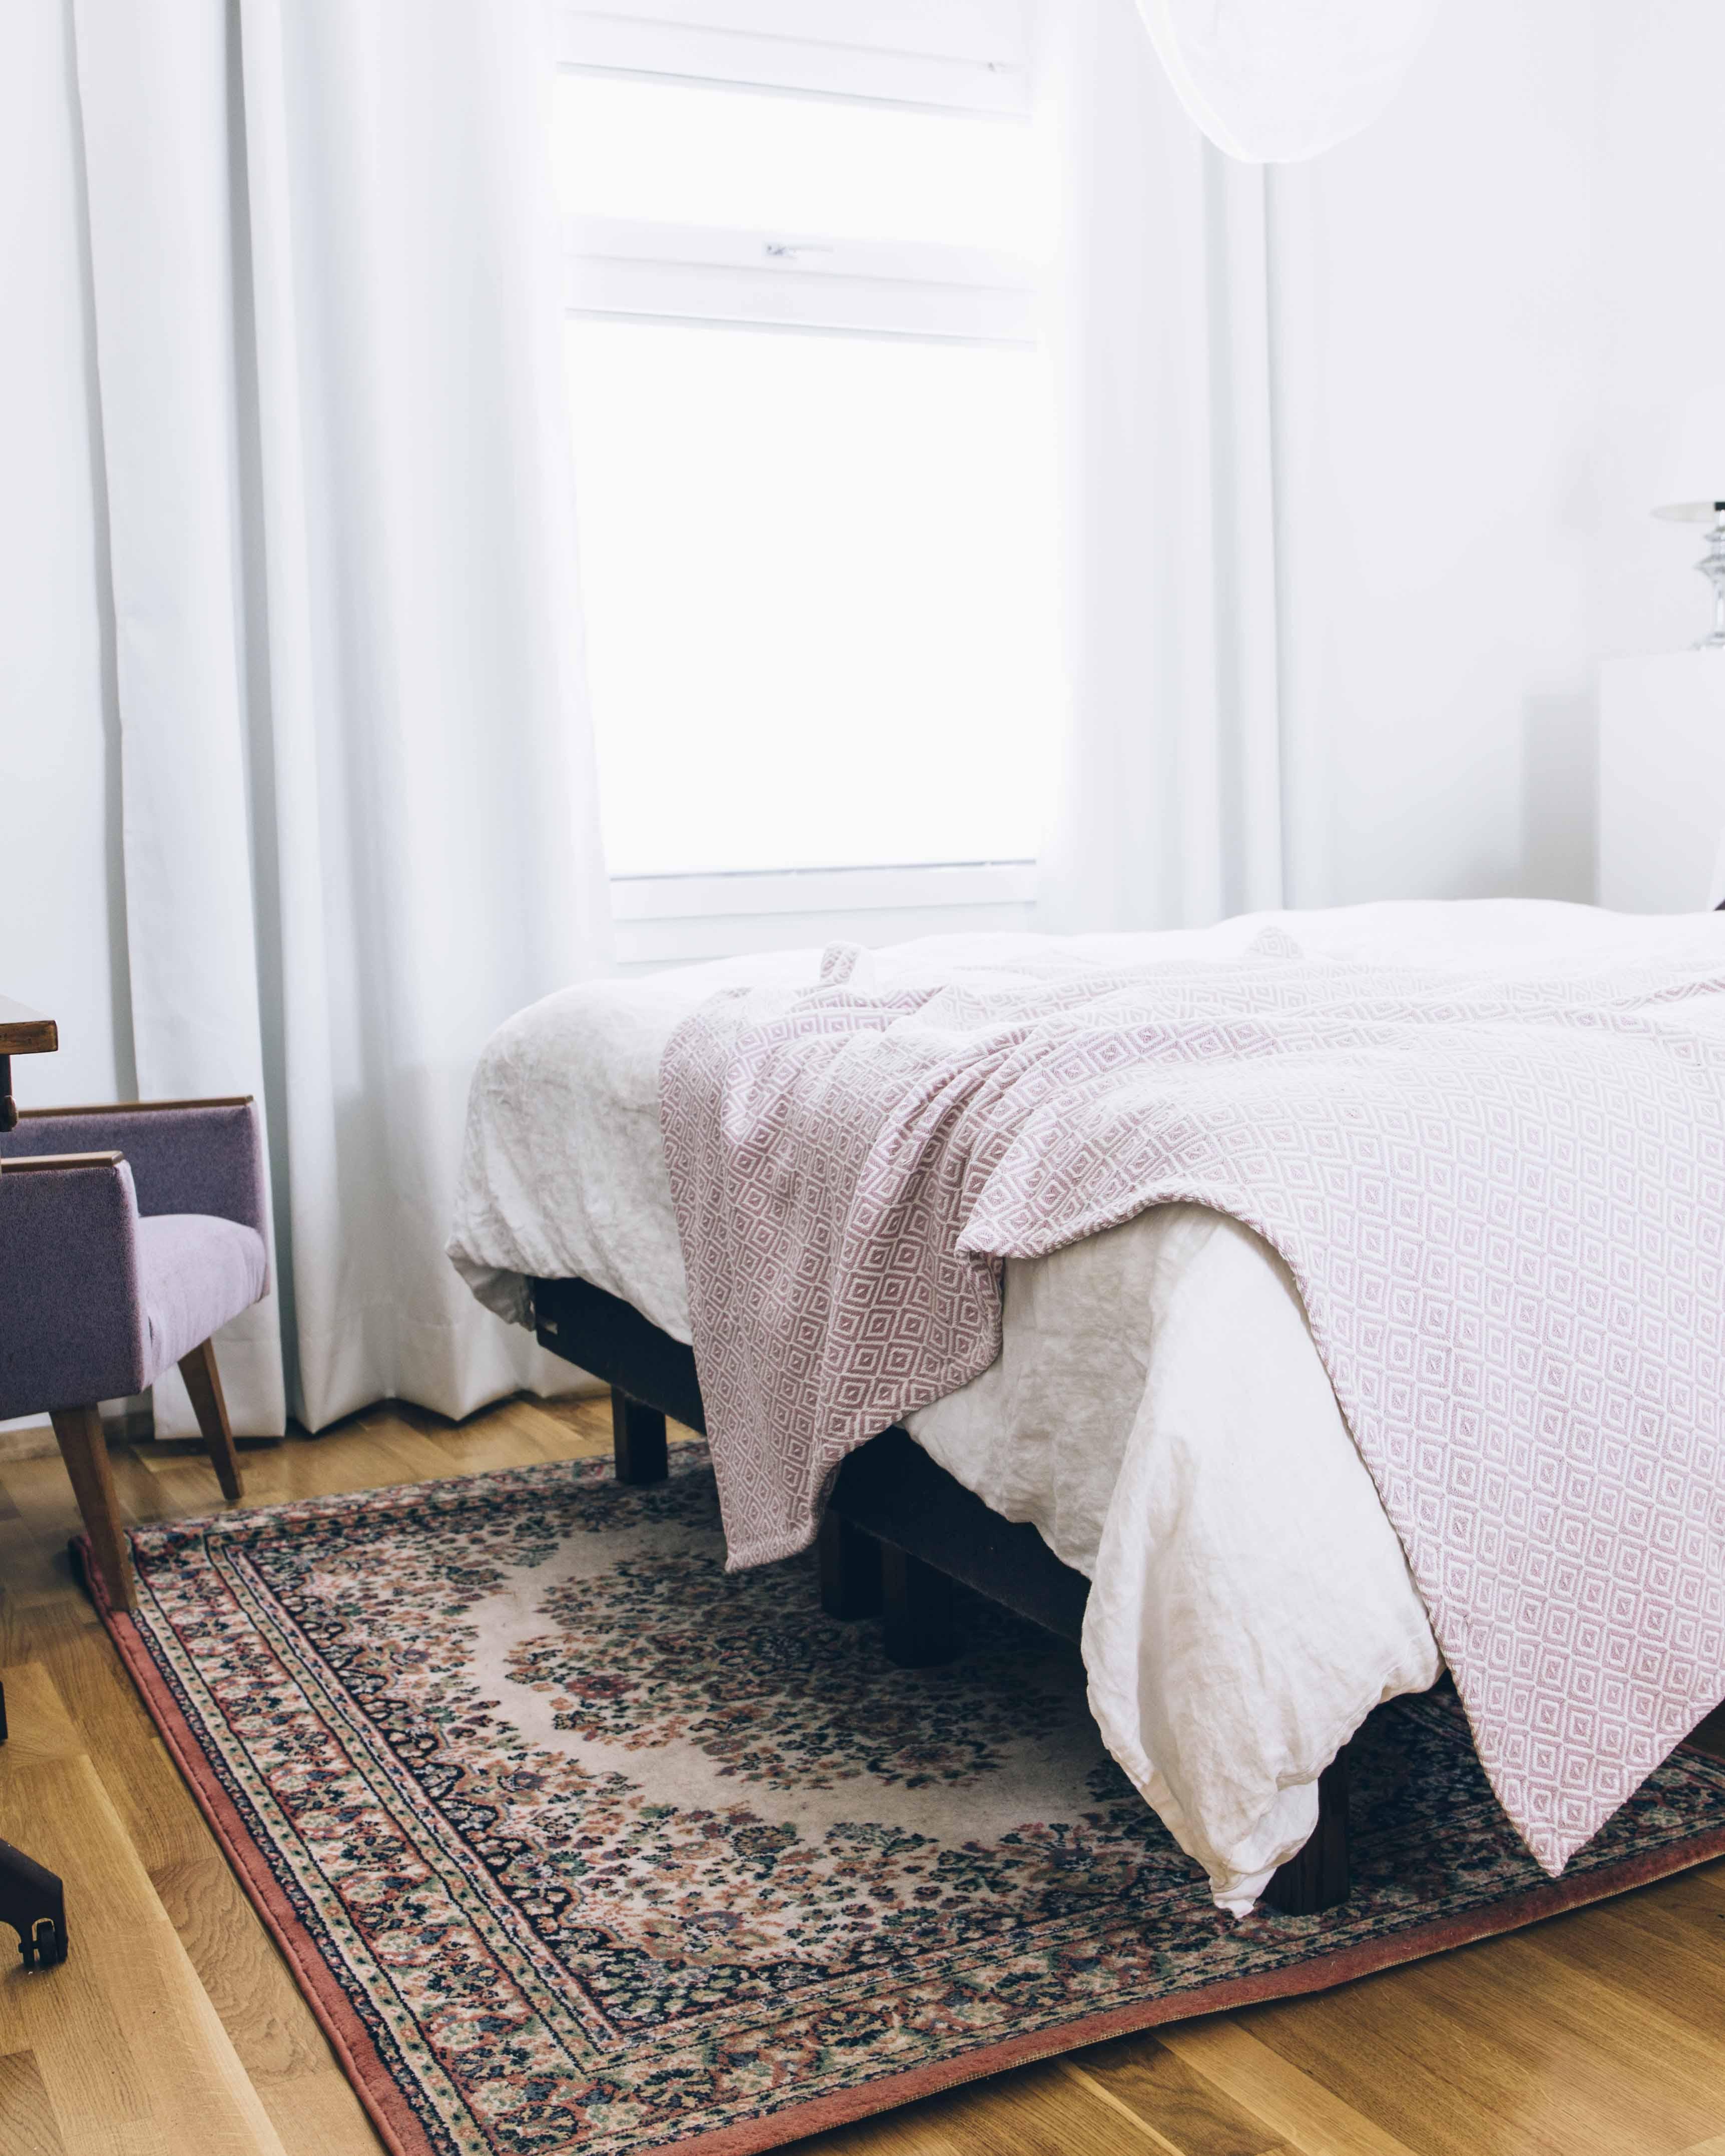 Pinossa uusi matto makuuhuoneessa 20052018 1